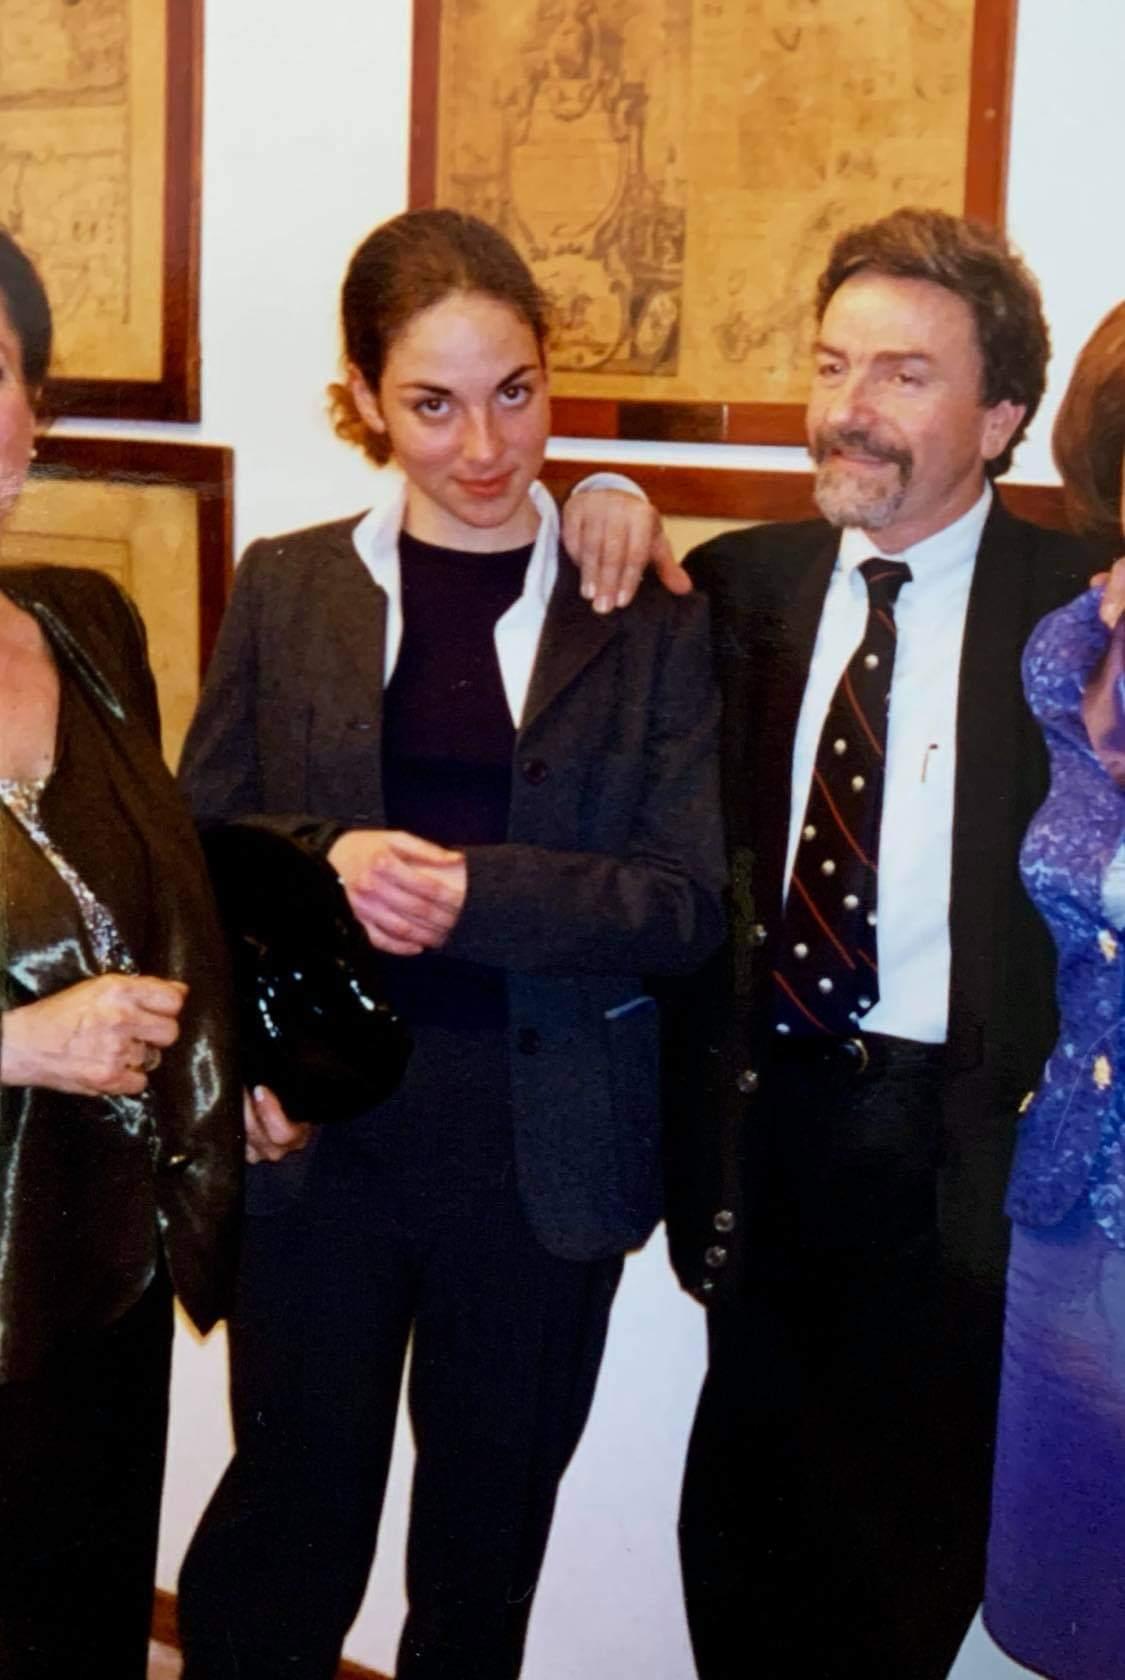 In memoriam Γιώργος Τόλης (1943-2018): Ο καρδιολόγος Θανάσης Δρίτσας γράφει για τη ζωή και το έργο του γιατρού και καθηγητή ενδοκρινολογίας.